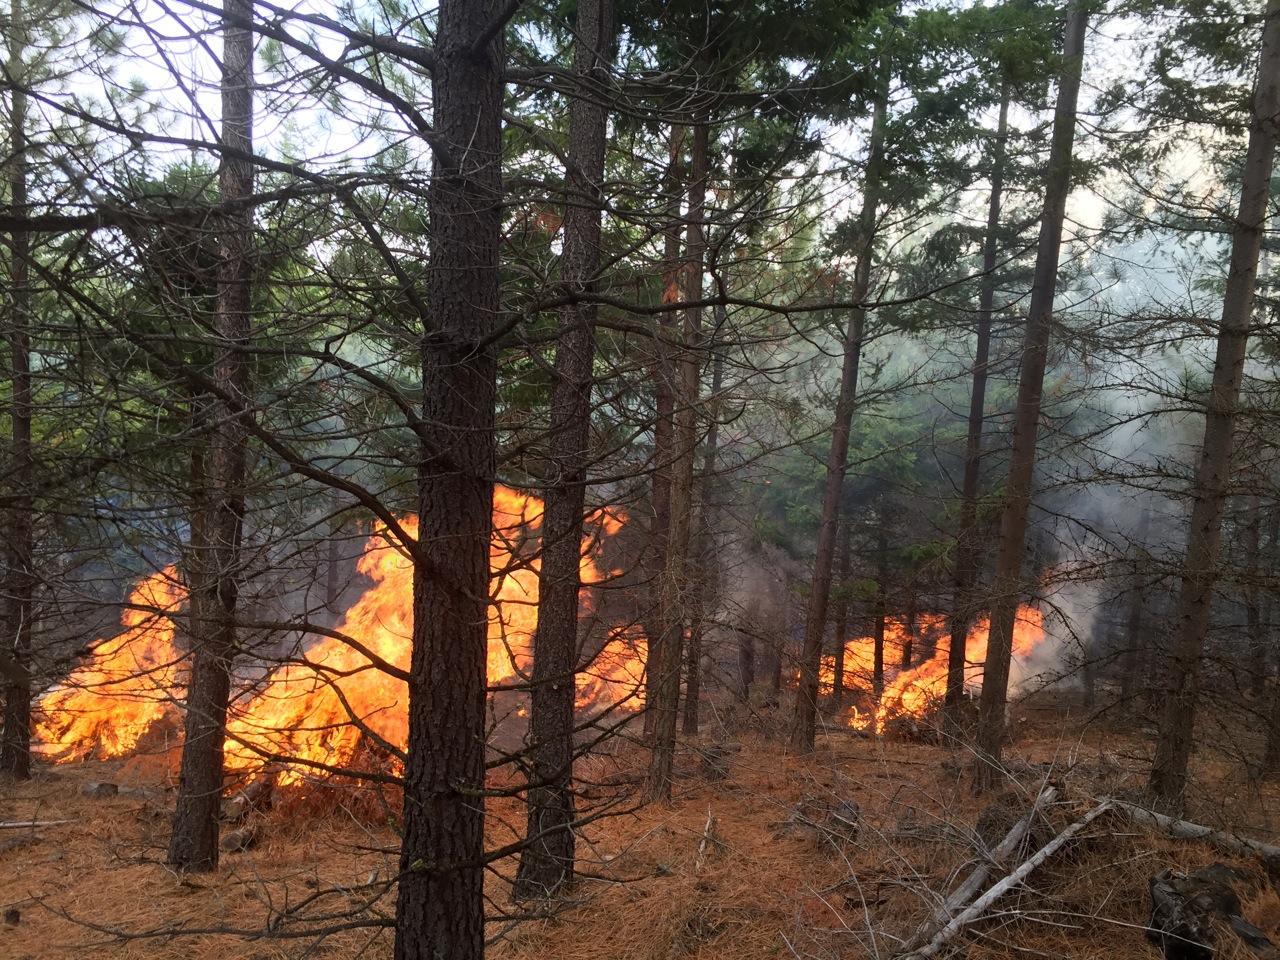 2016: Prescribed Fire Pilot Project